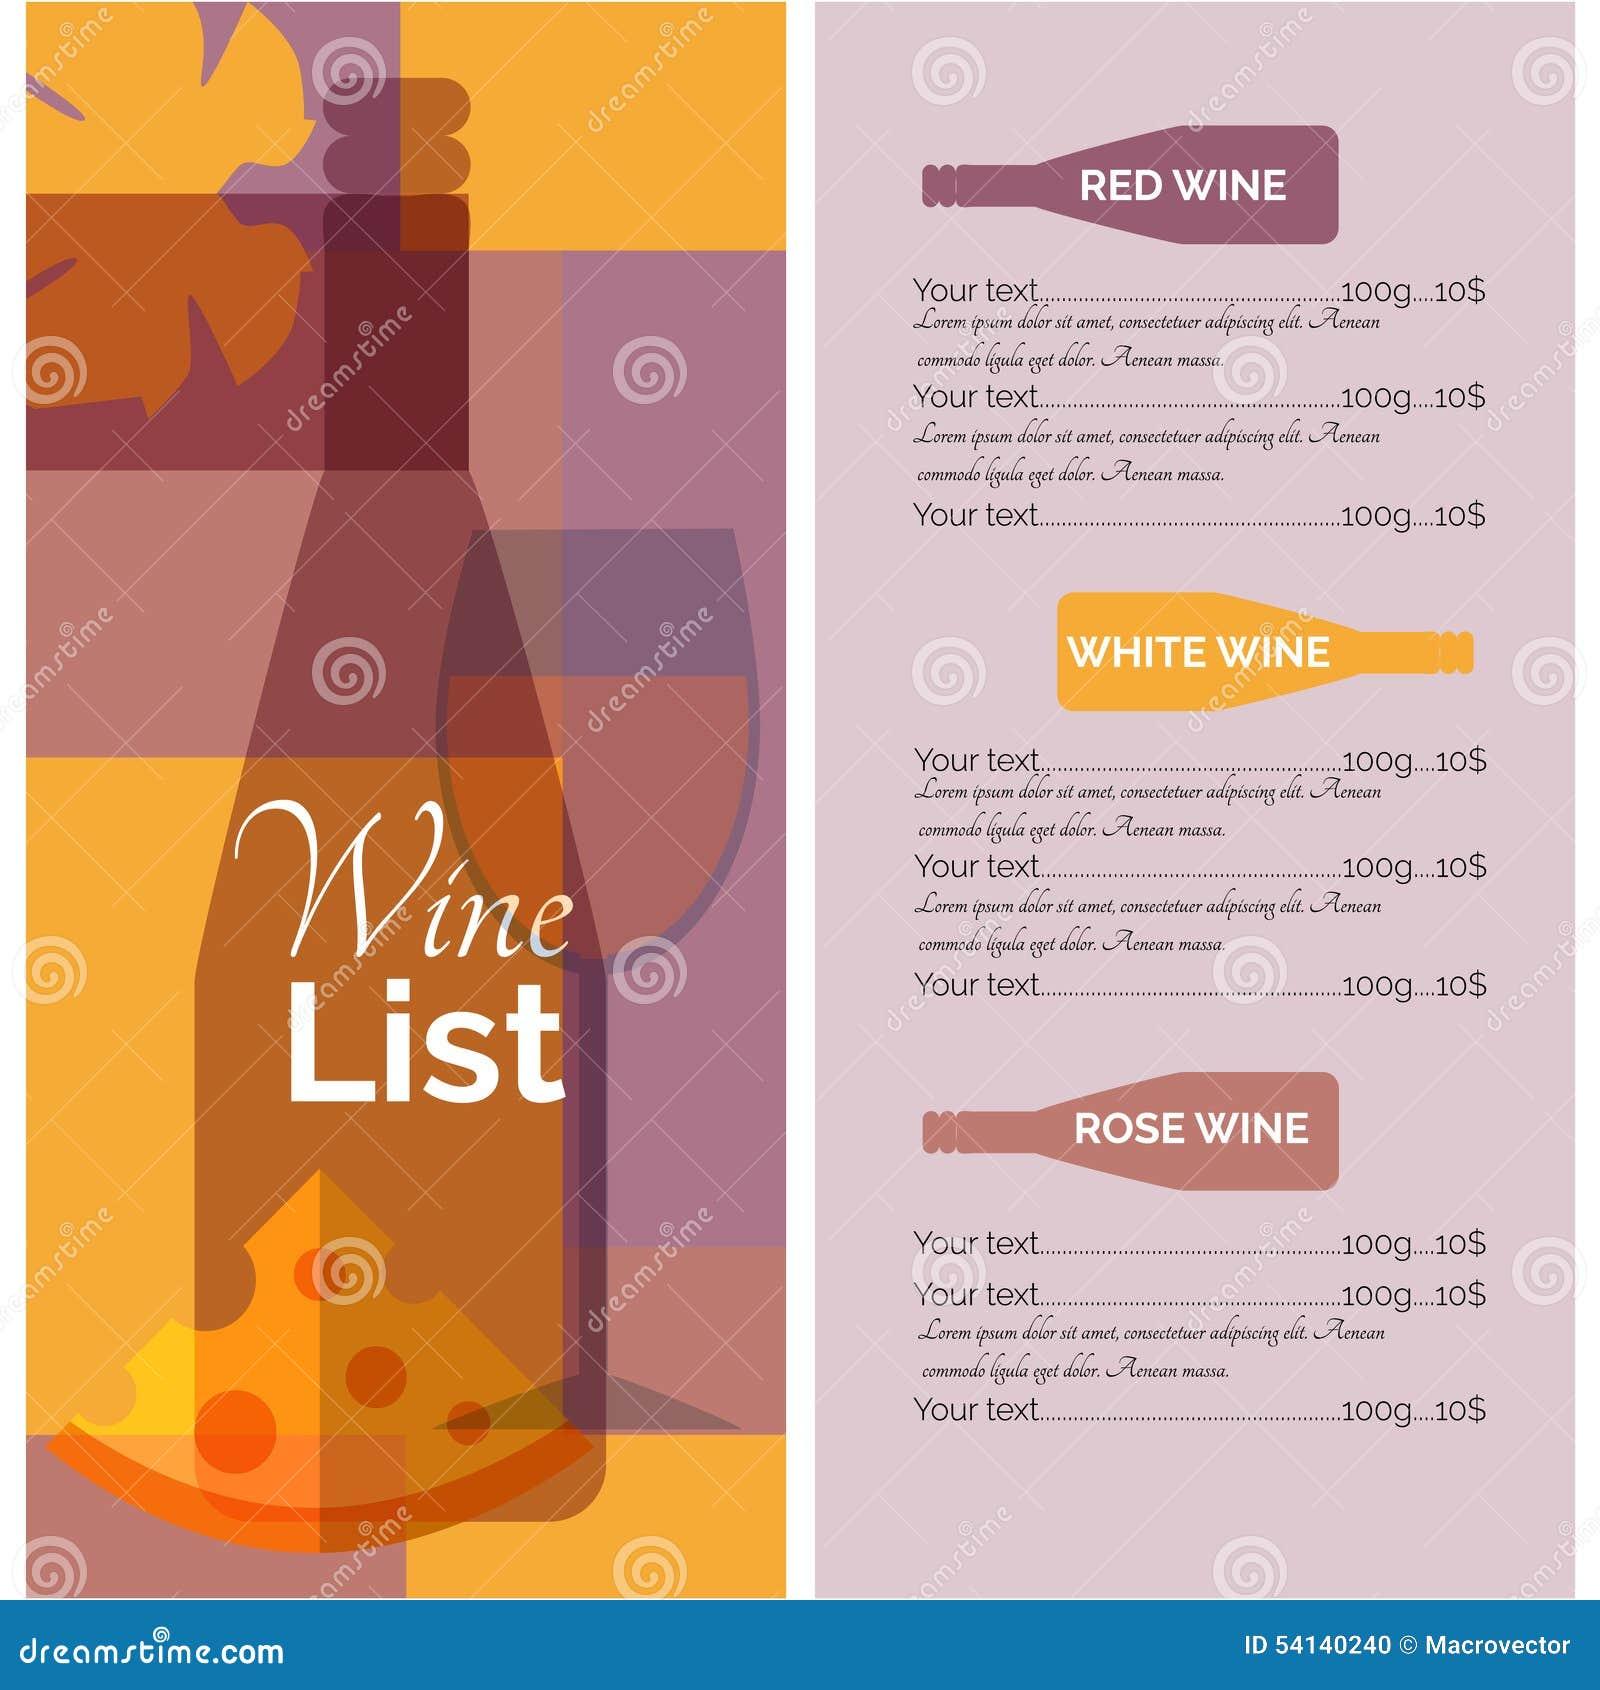 Wine Menu List Stencil Print Stock Vector - Image: 54140240